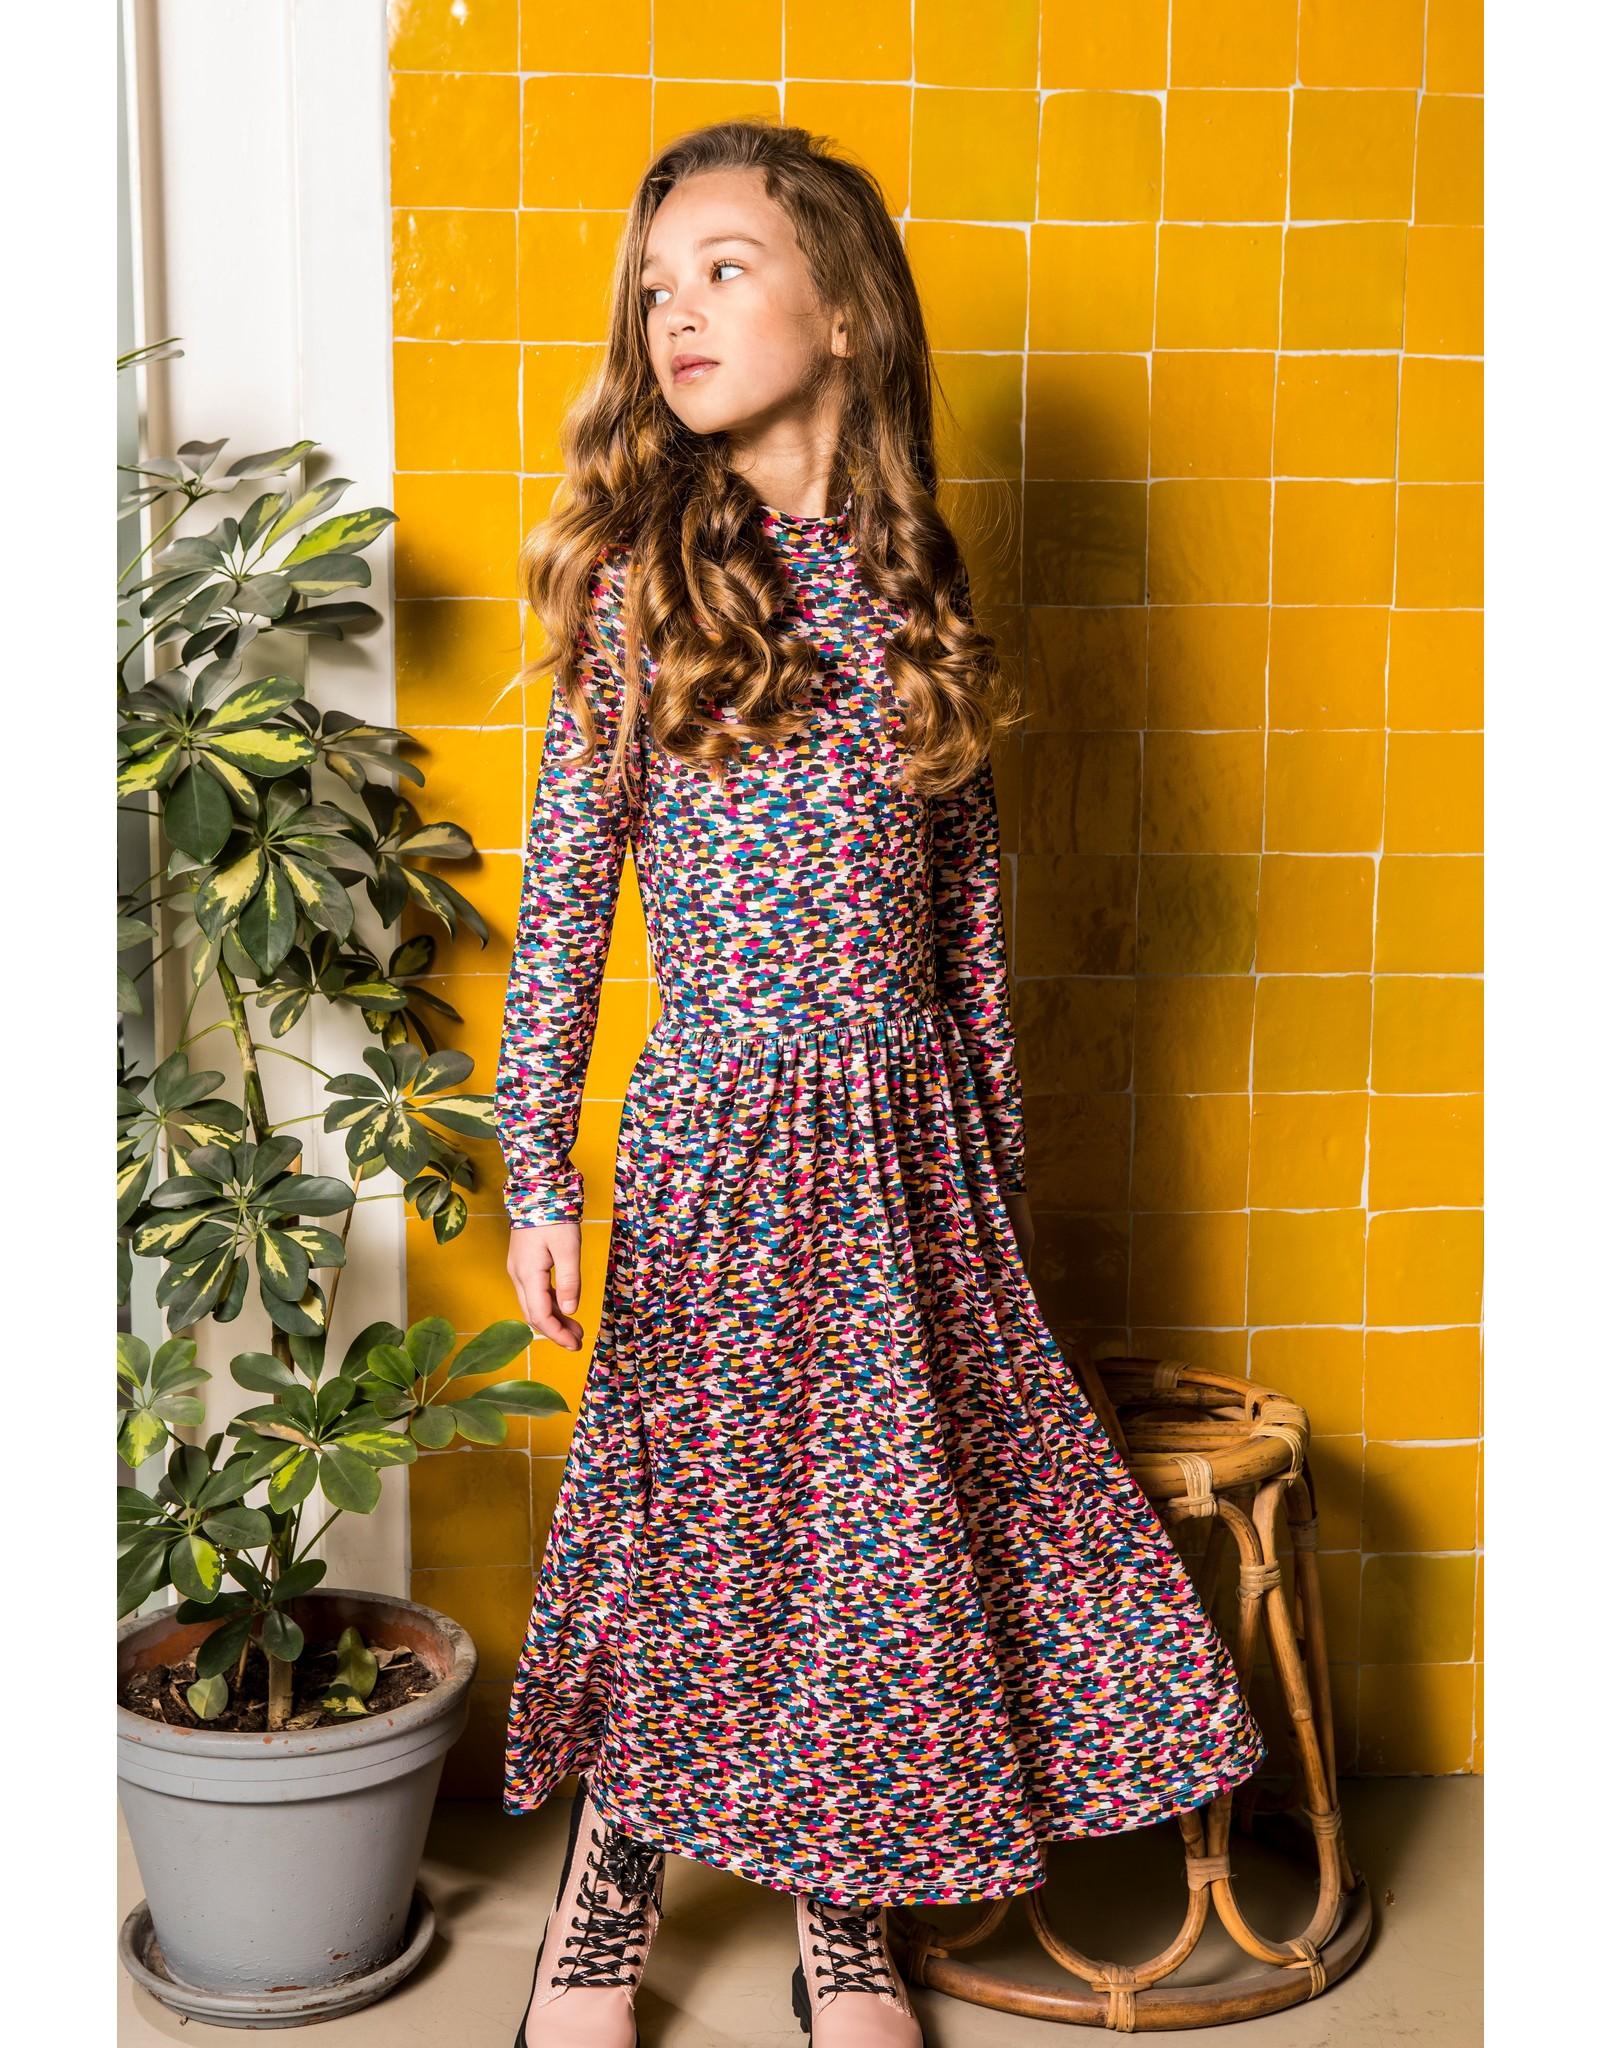 B.Nosy Girls sporty spickles ao maxi dress